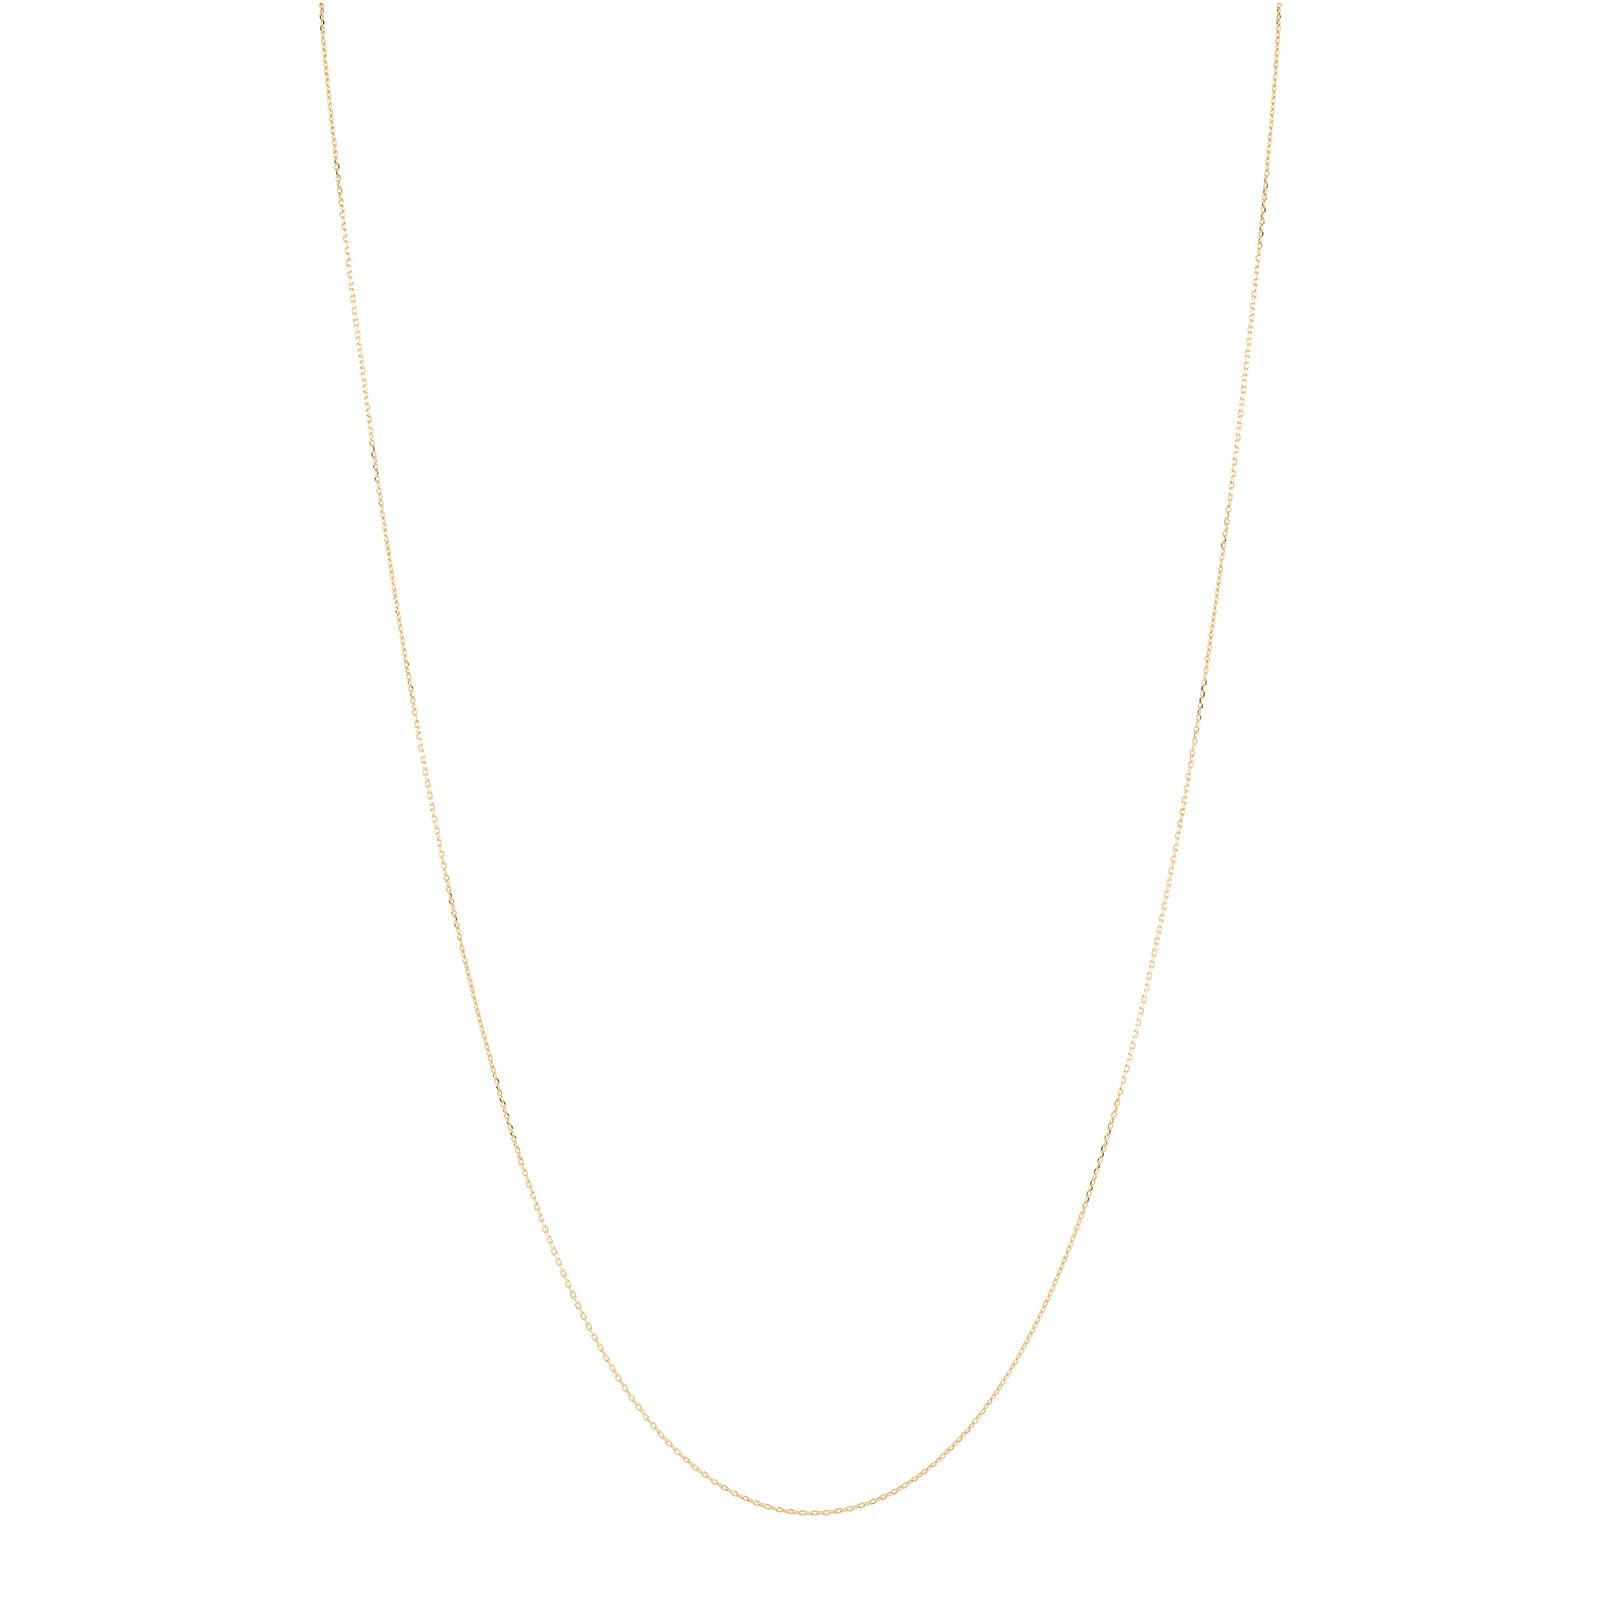 Halsband 18k guld - Ankarkedja 45+5 cm